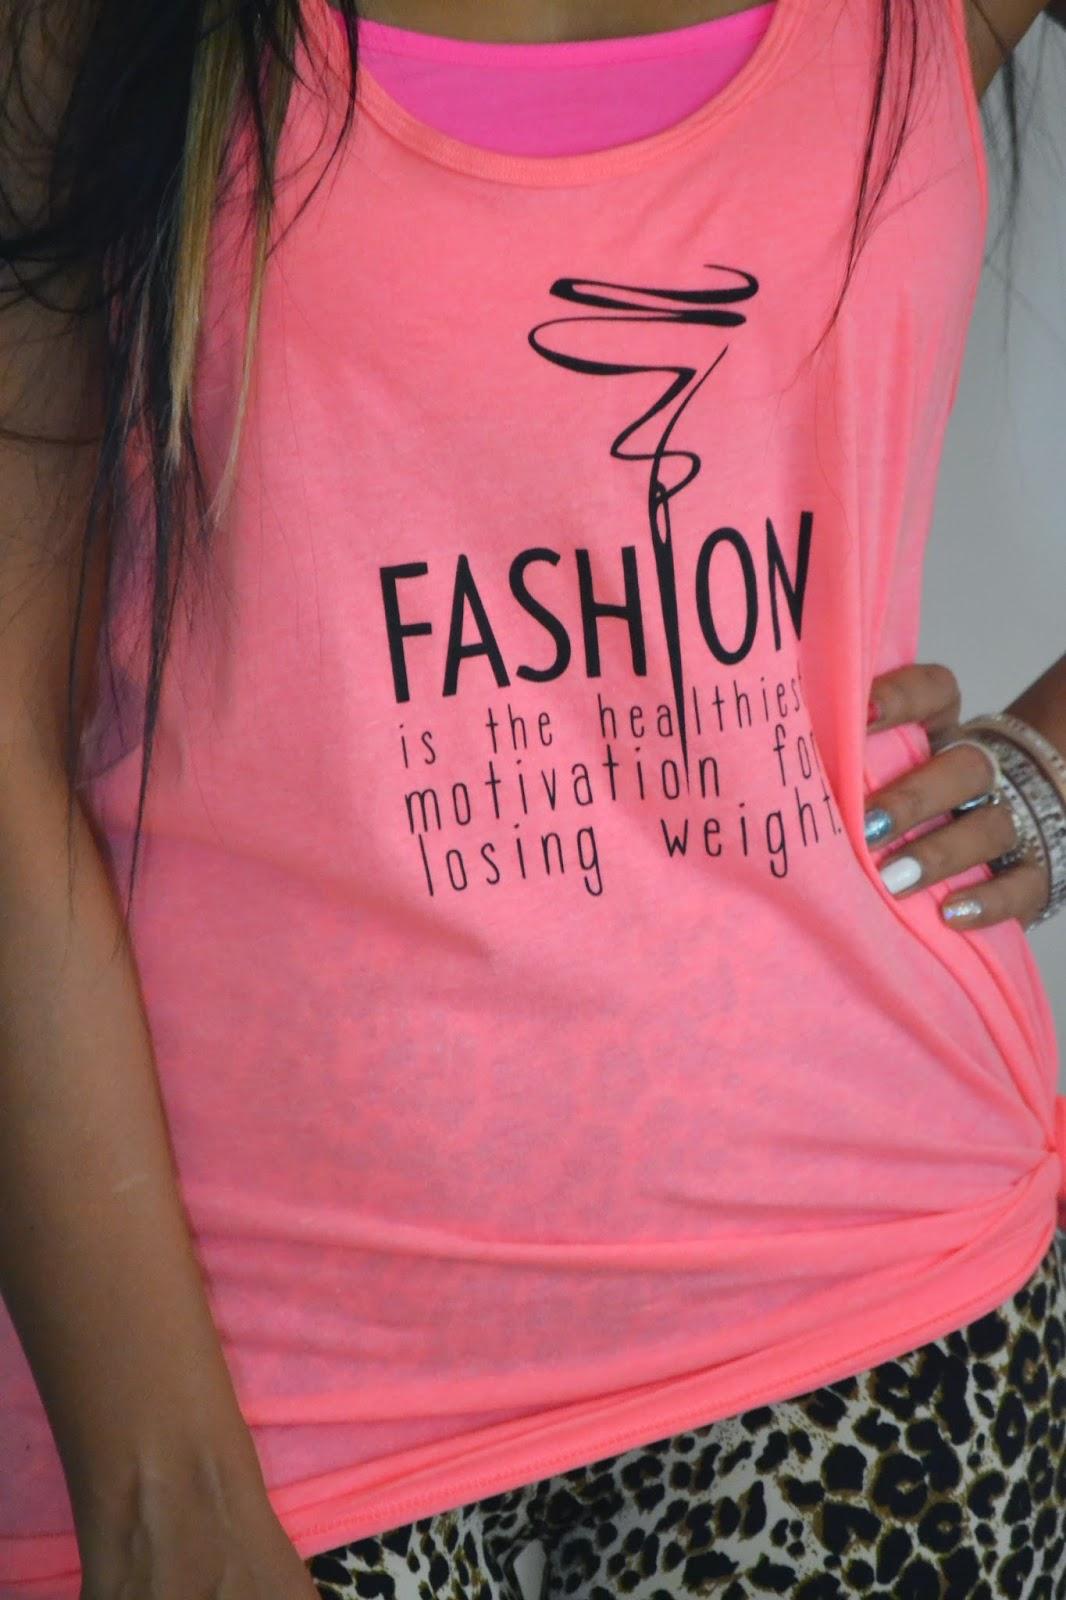 shopping fashion, Korean fashion, wholesale clothing, fashion clothes, fashion clothing, designer fashion